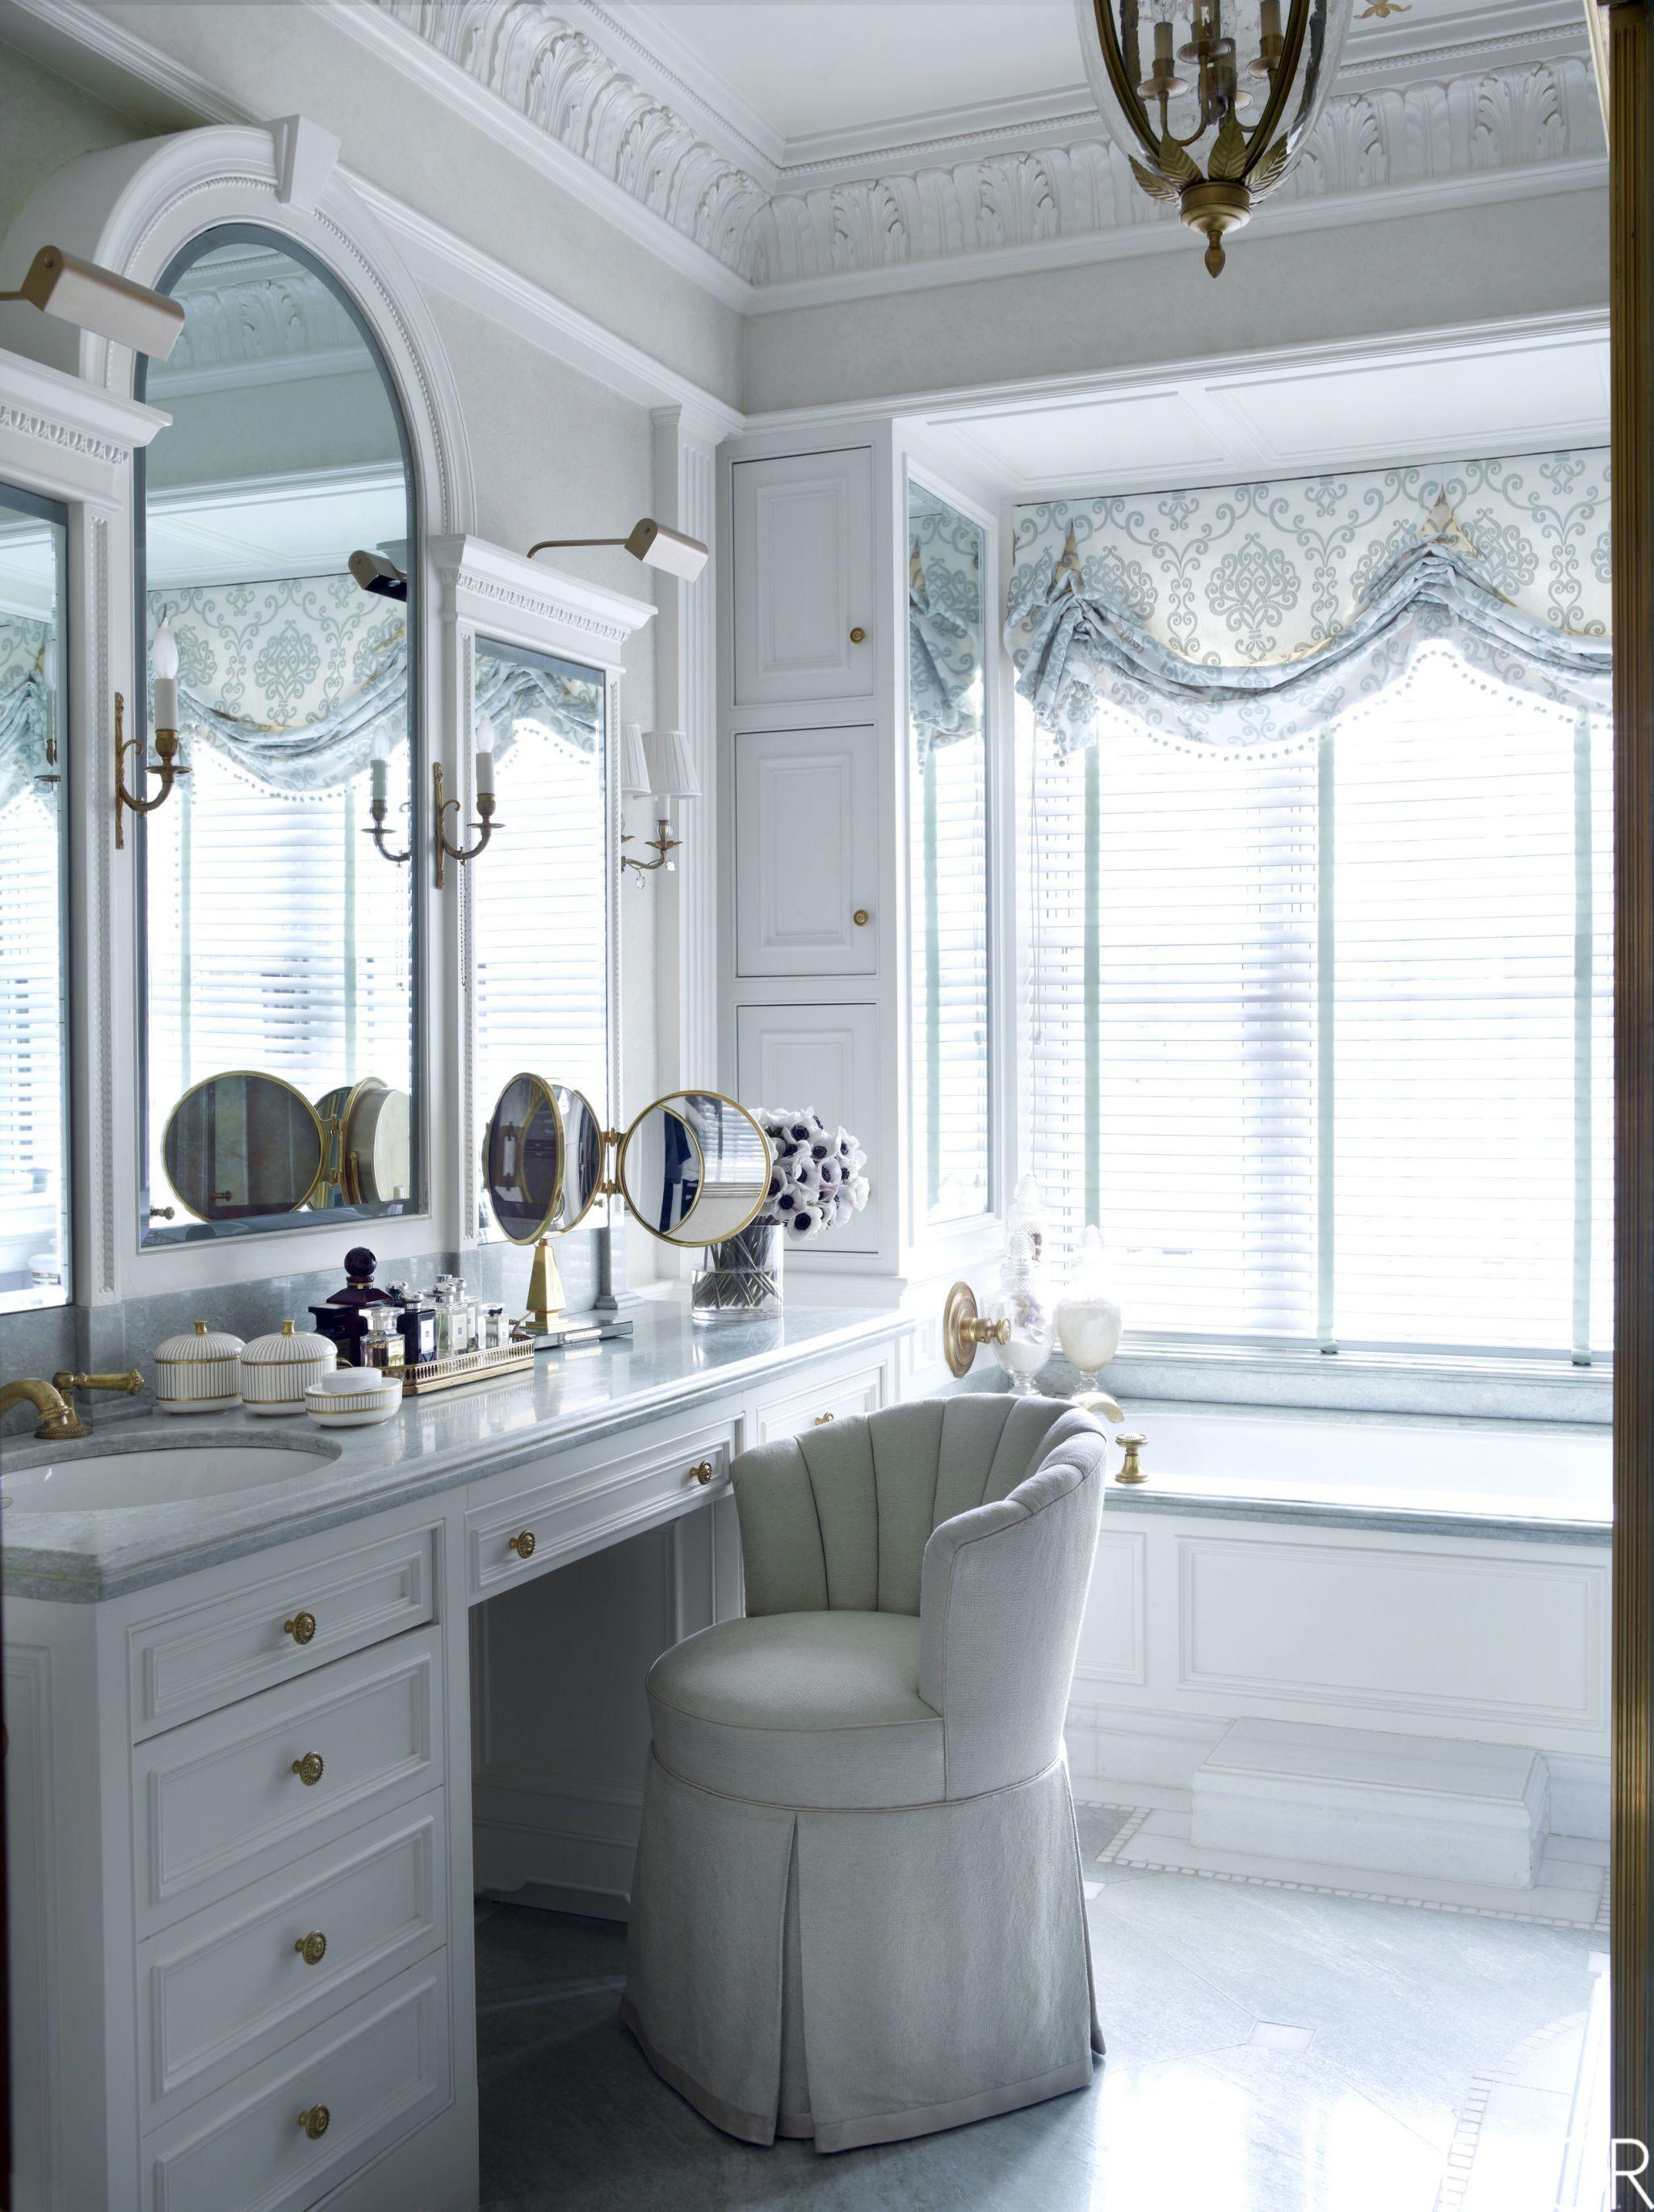 23 Best Bathroom Storage Ideas - Bathroom Organizers